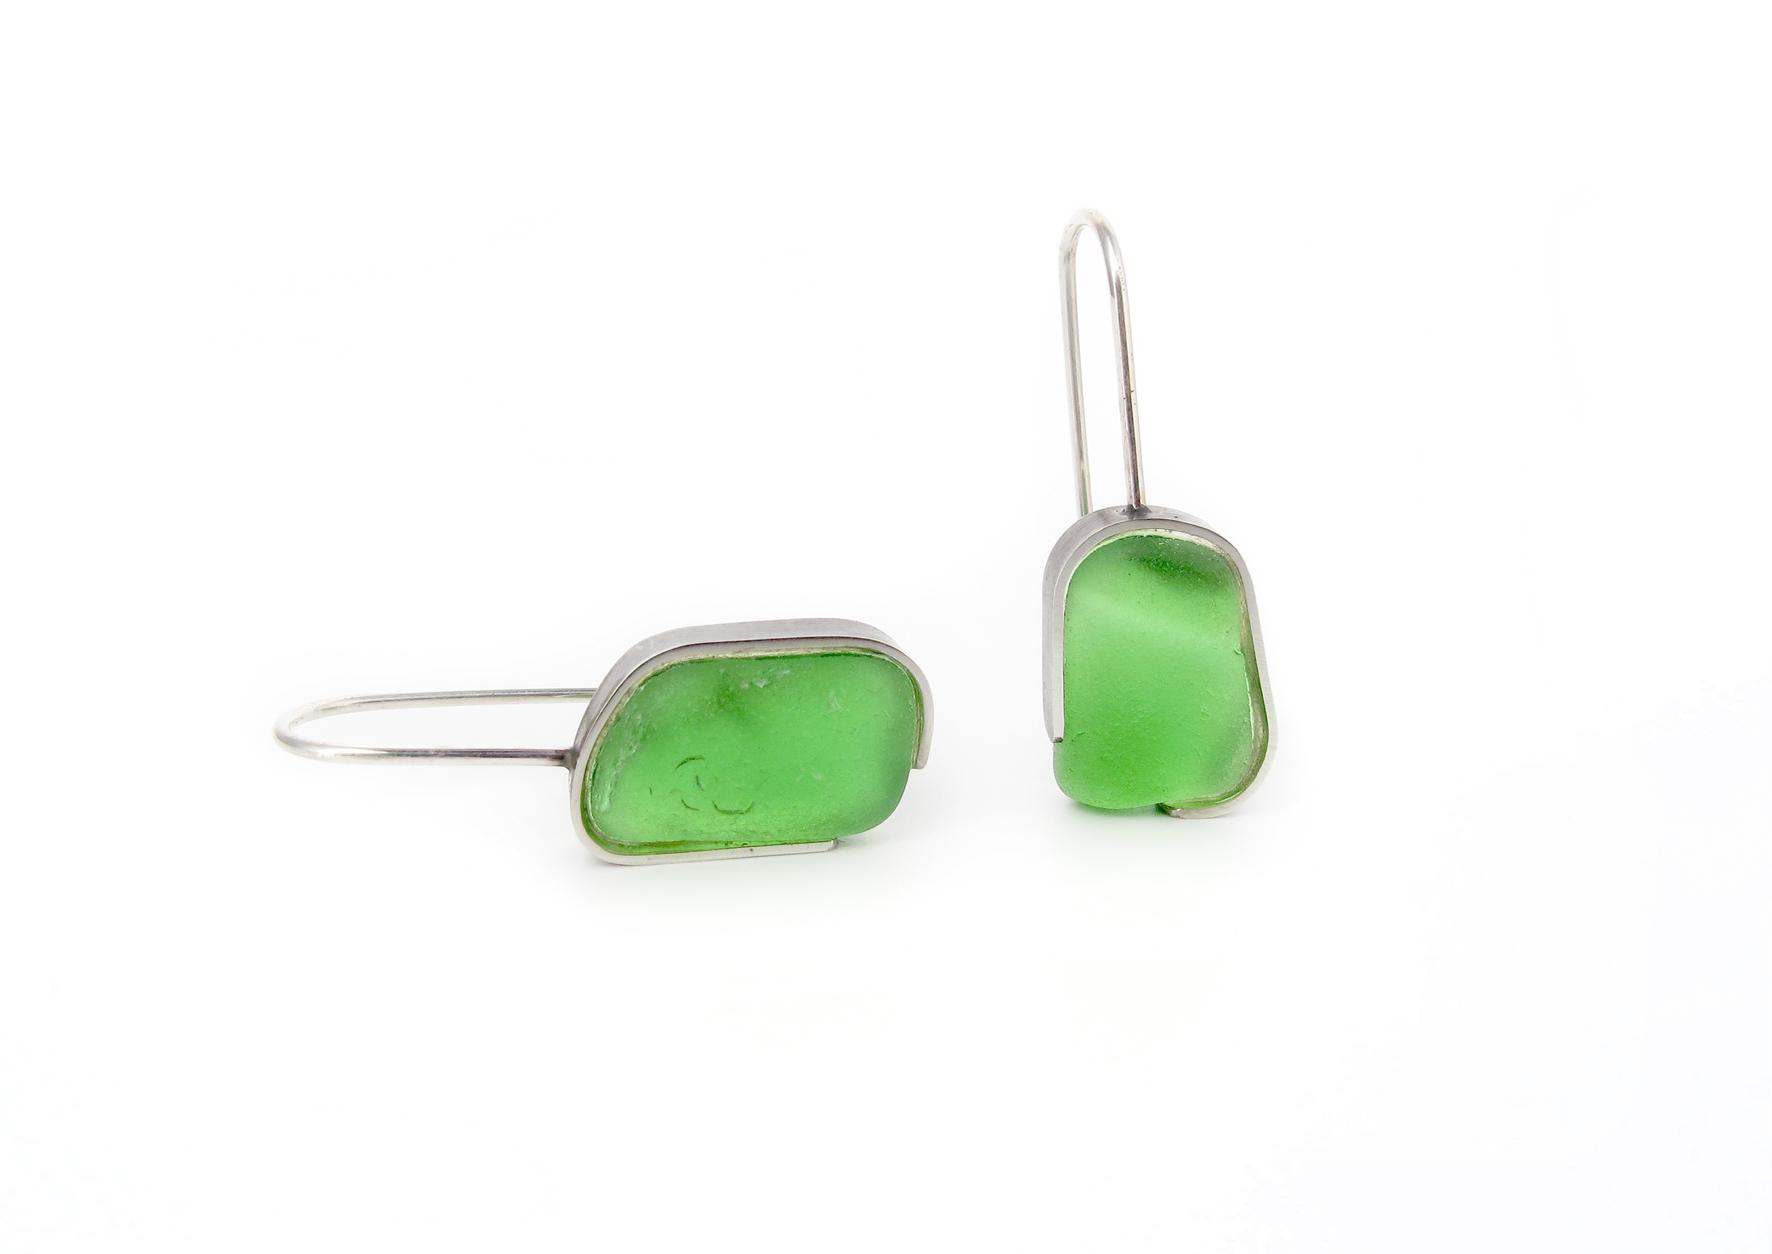 green beach glass earrings 1.jpg